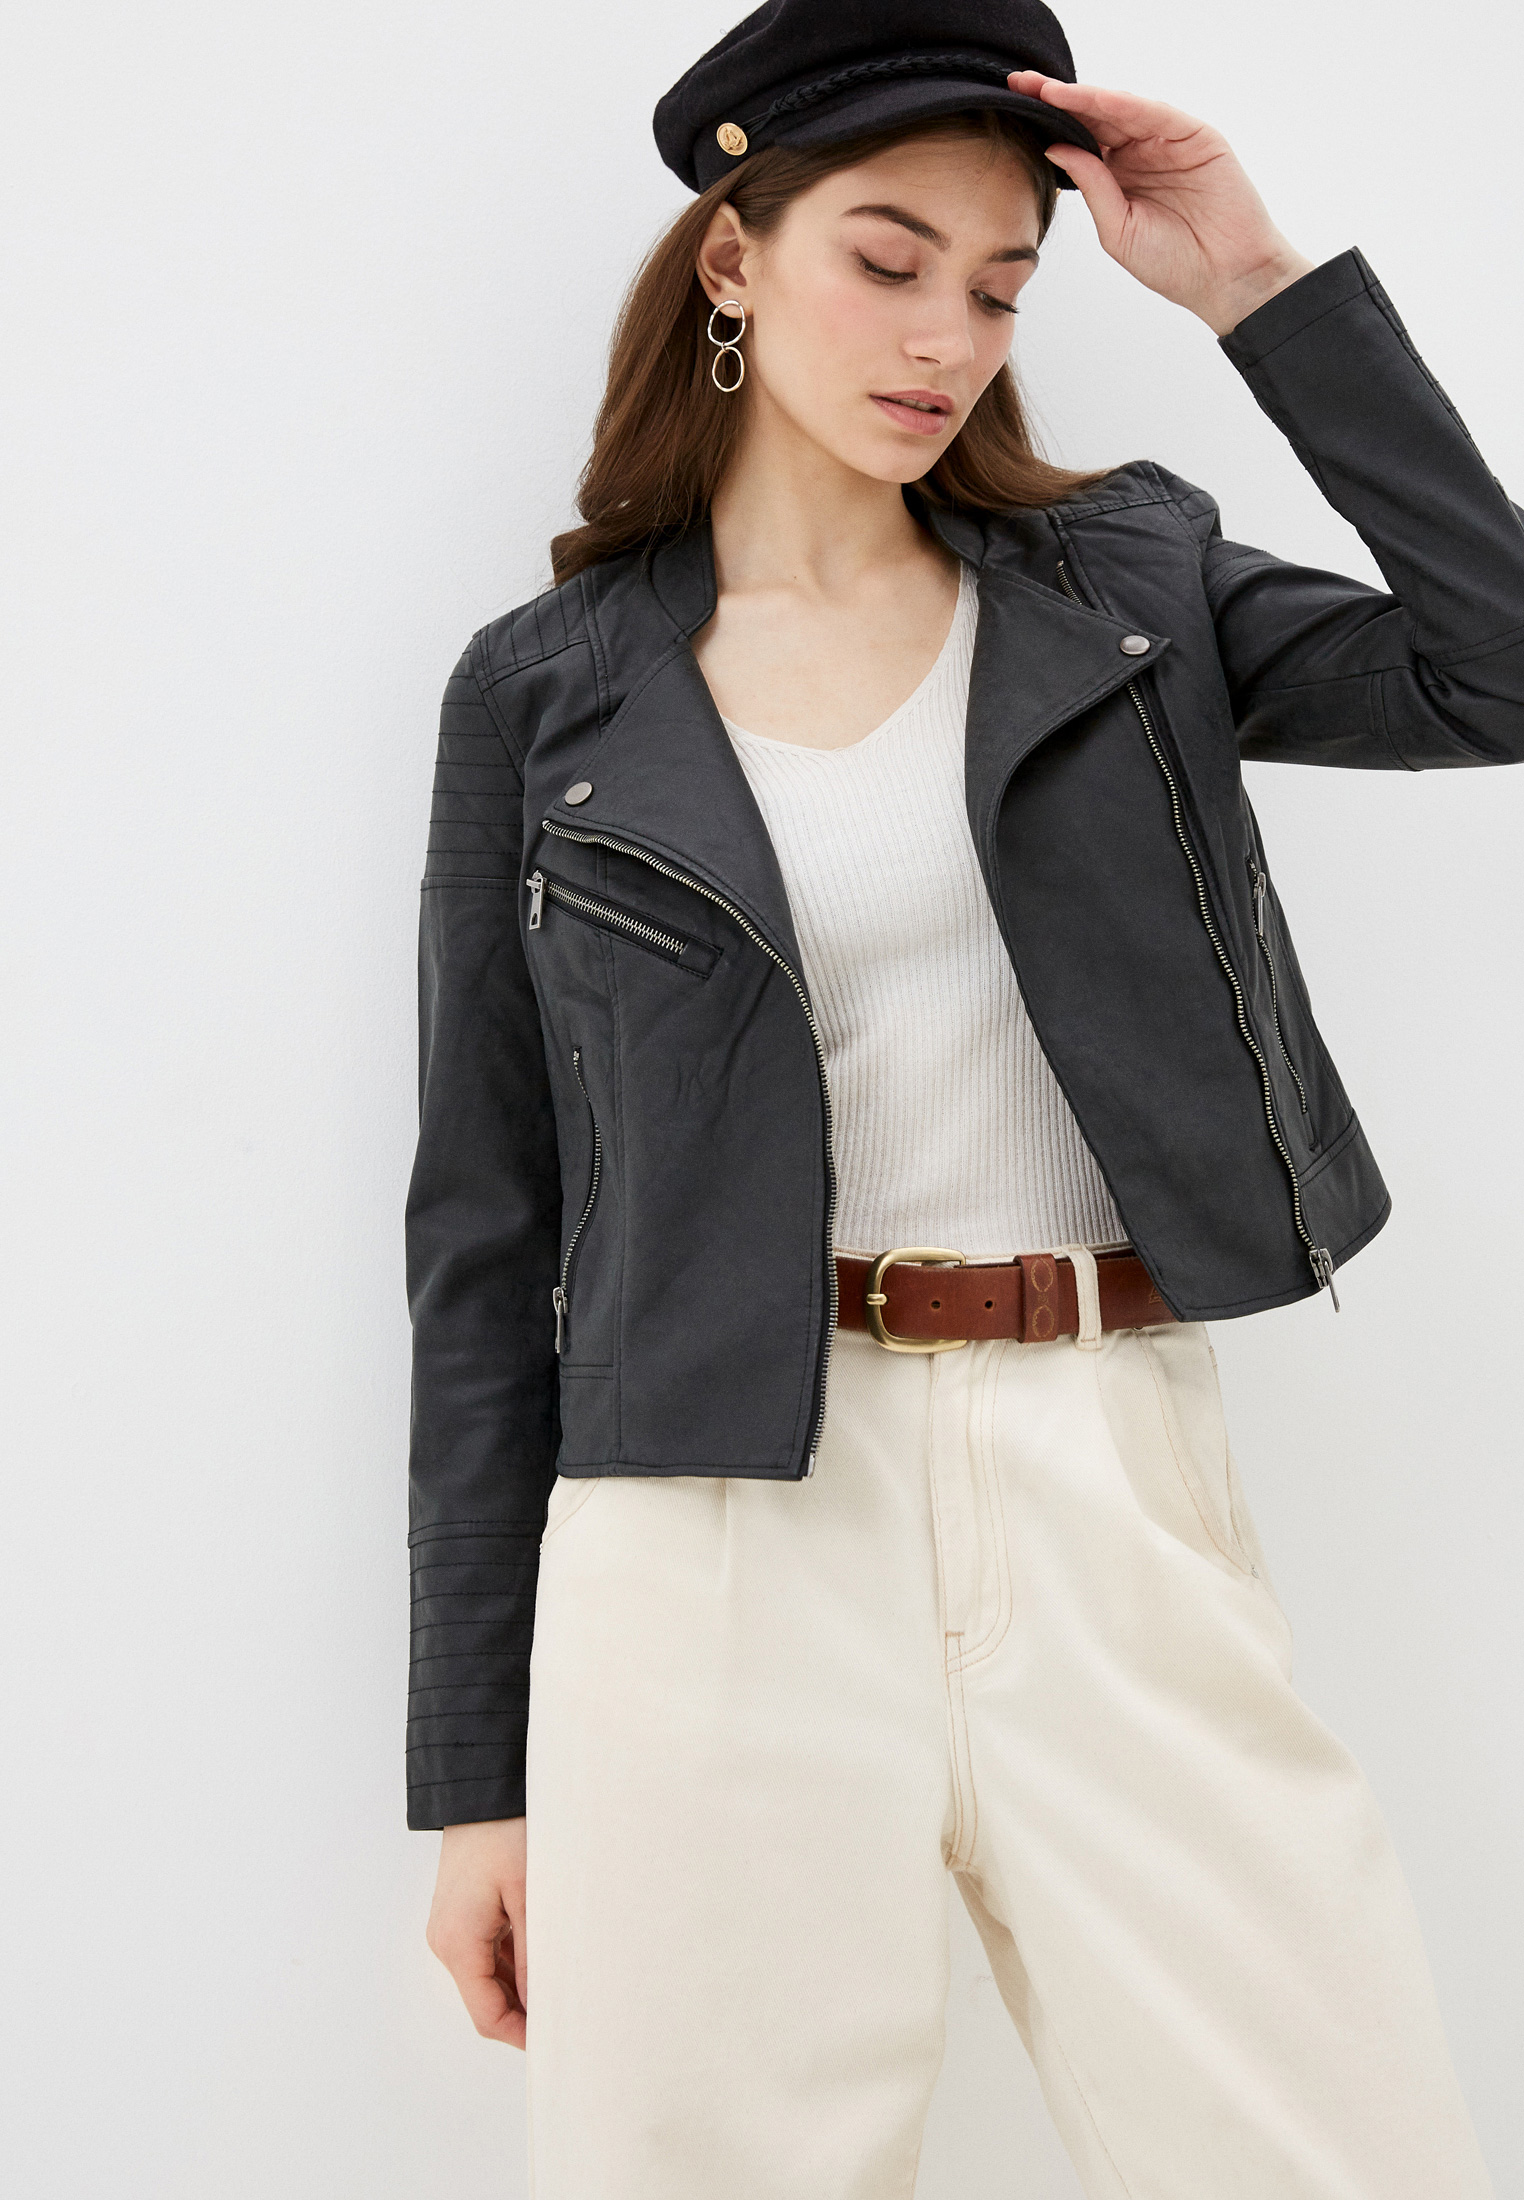 Кожаная куртка Vero Moda Куртка кожаная Vero Moda